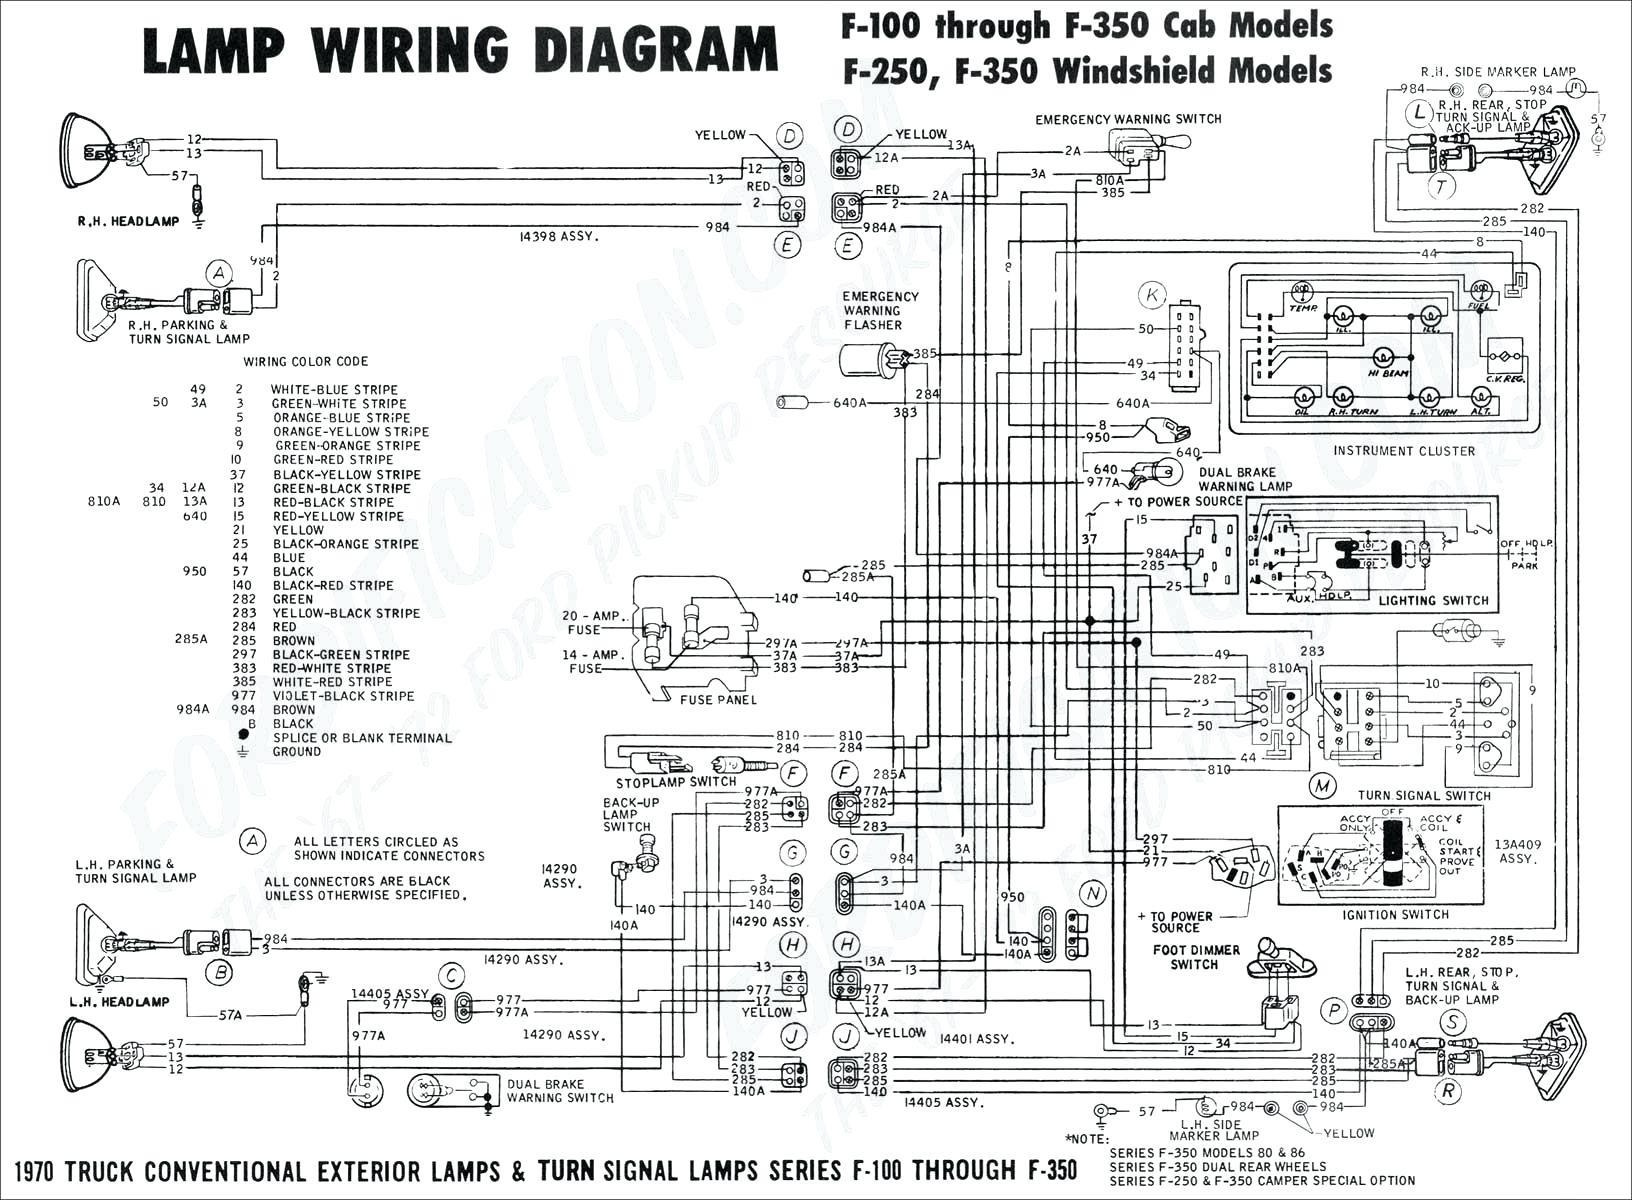 fecon wiring diagram wiring diagram data oreo Harness Diagram Motorcycle fecon wiring diagram wiring diagram wiring diagram symbols fecon wiring diagram